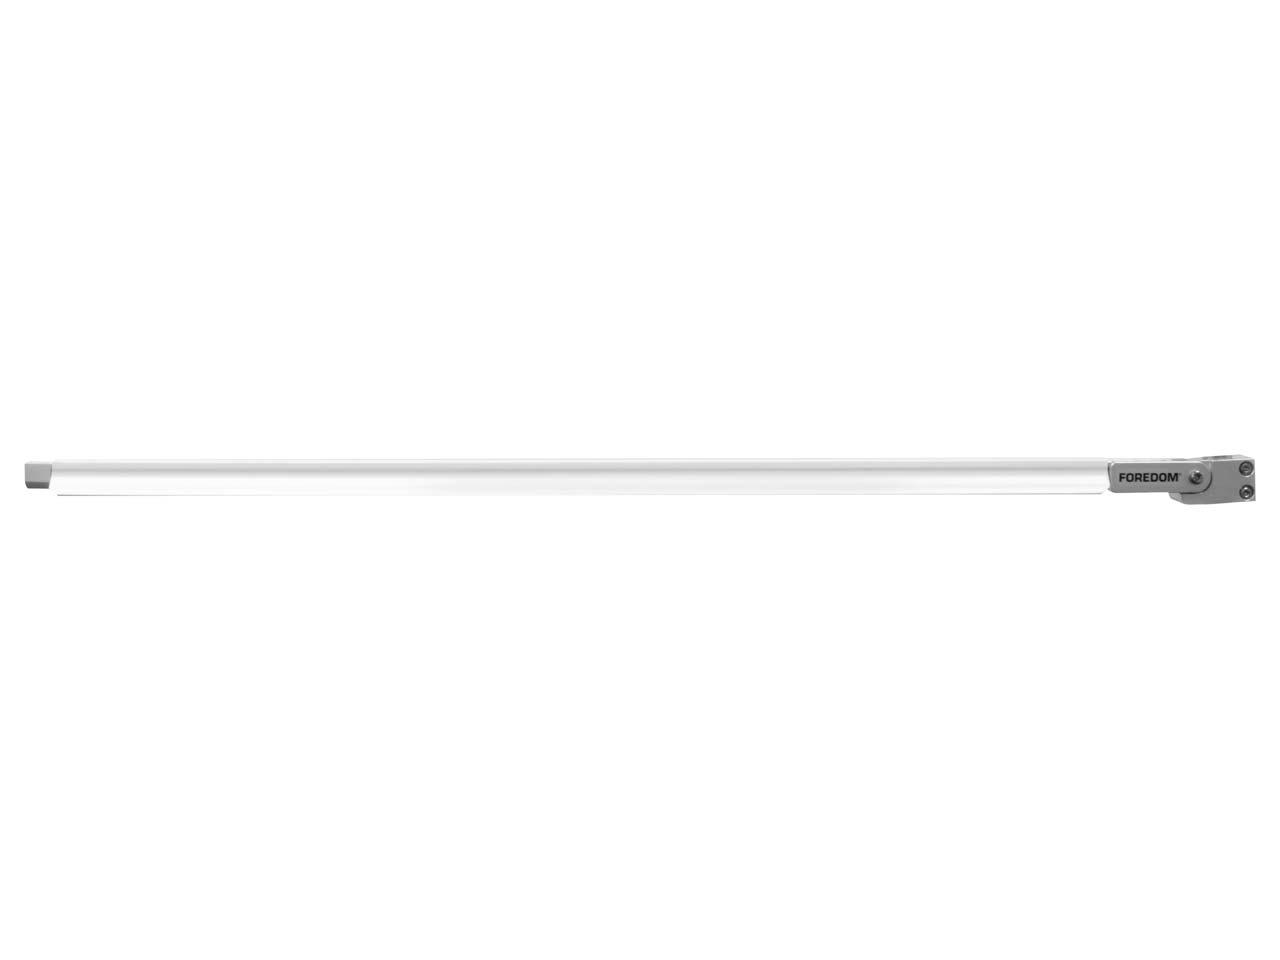 Genuine-US-Foredom-Workbench-Accessories-System miniatura 24